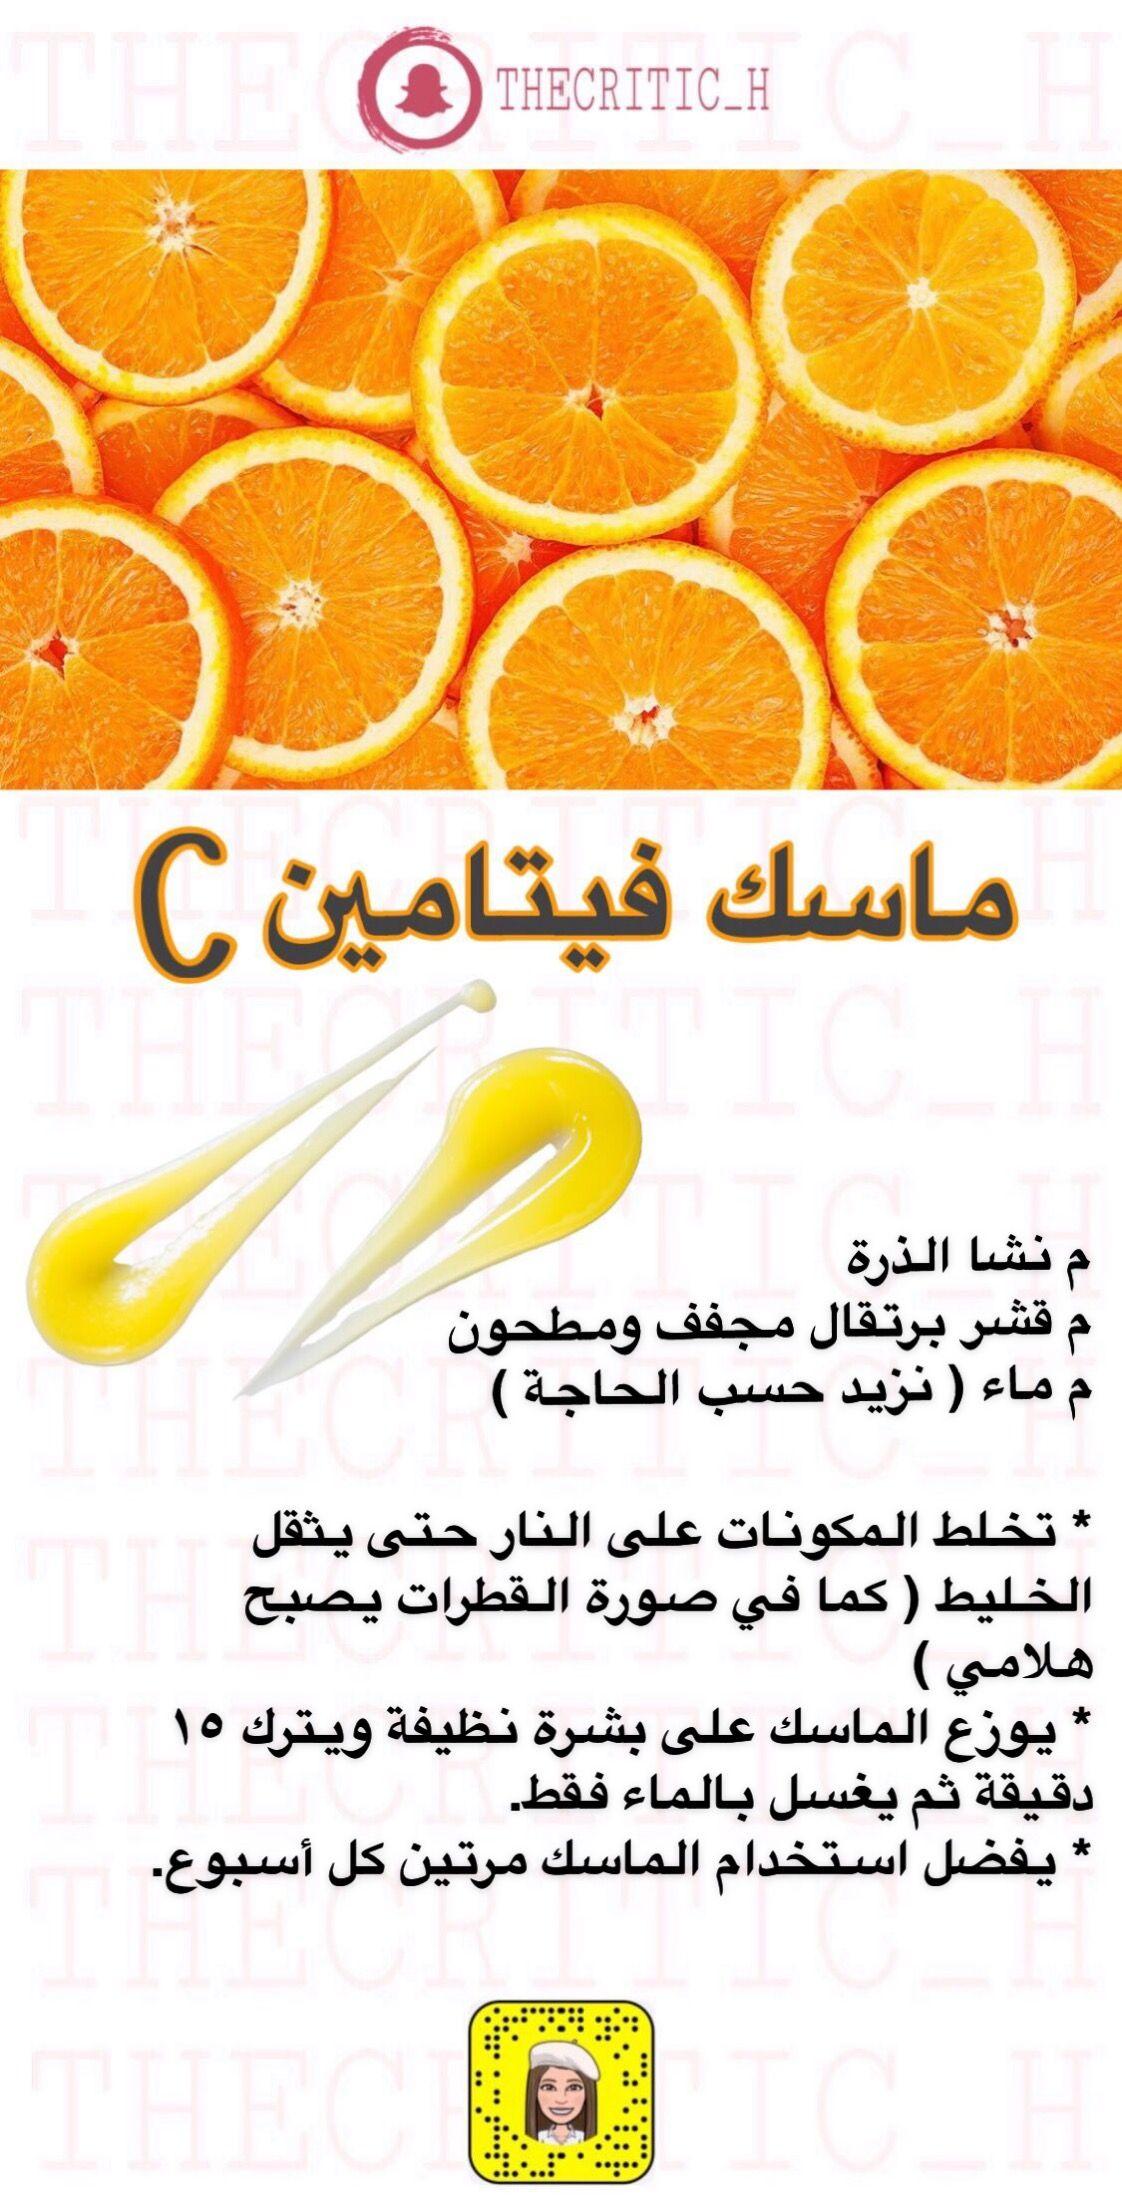 ماسك فيتامين سي C Body Skin Care Lip Scrub Diy Health And Beauty Tips